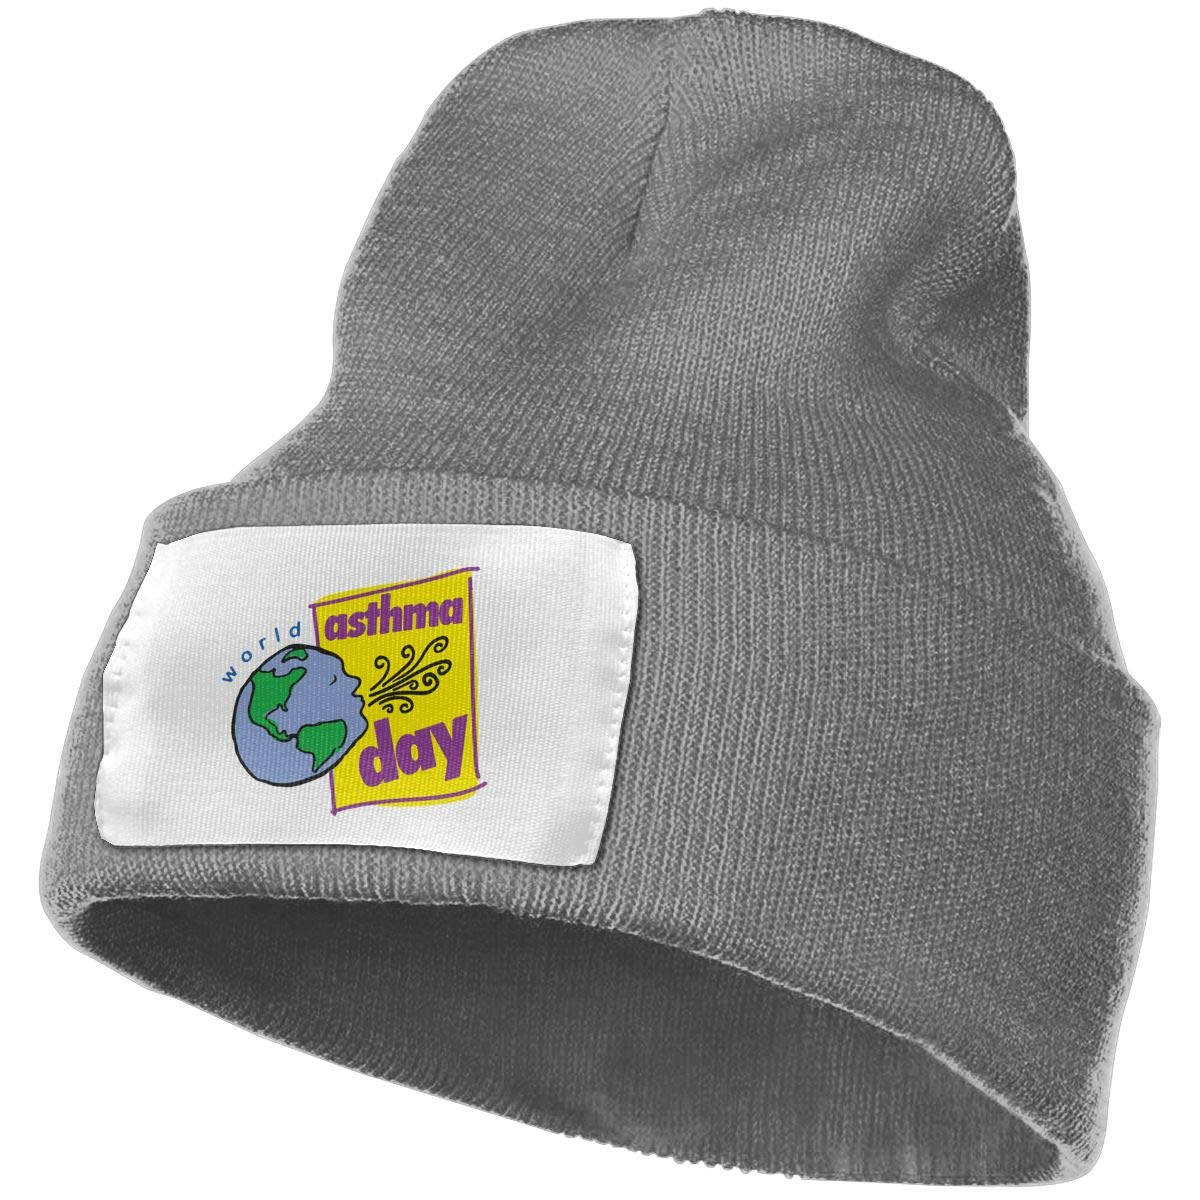 TAOMAP89 World Asthma Day 2 Men /& Women Skull Caps Winter Warm Stretchy Knitting Beanie Hats